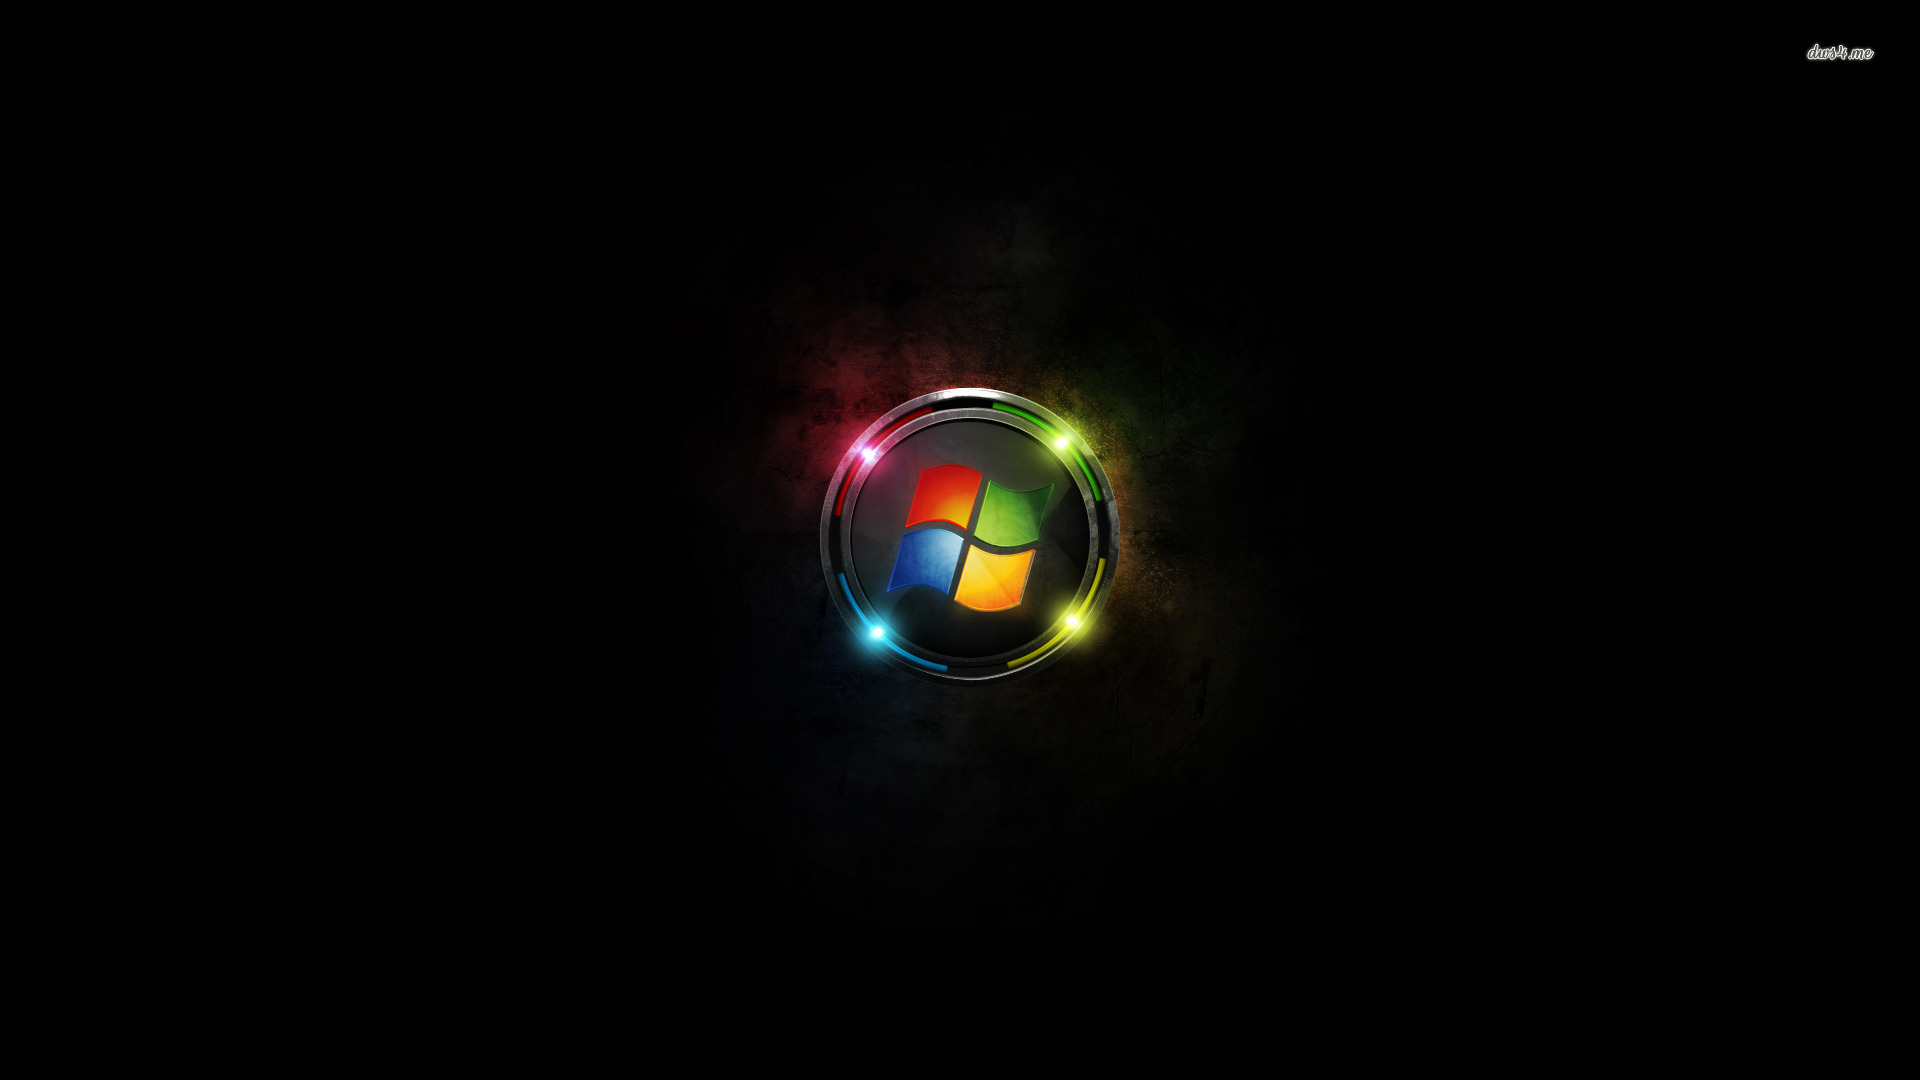 Windows Logo Wallpaper 35962 Hd Wallpapers Background   HDesktopscom 1920x1080